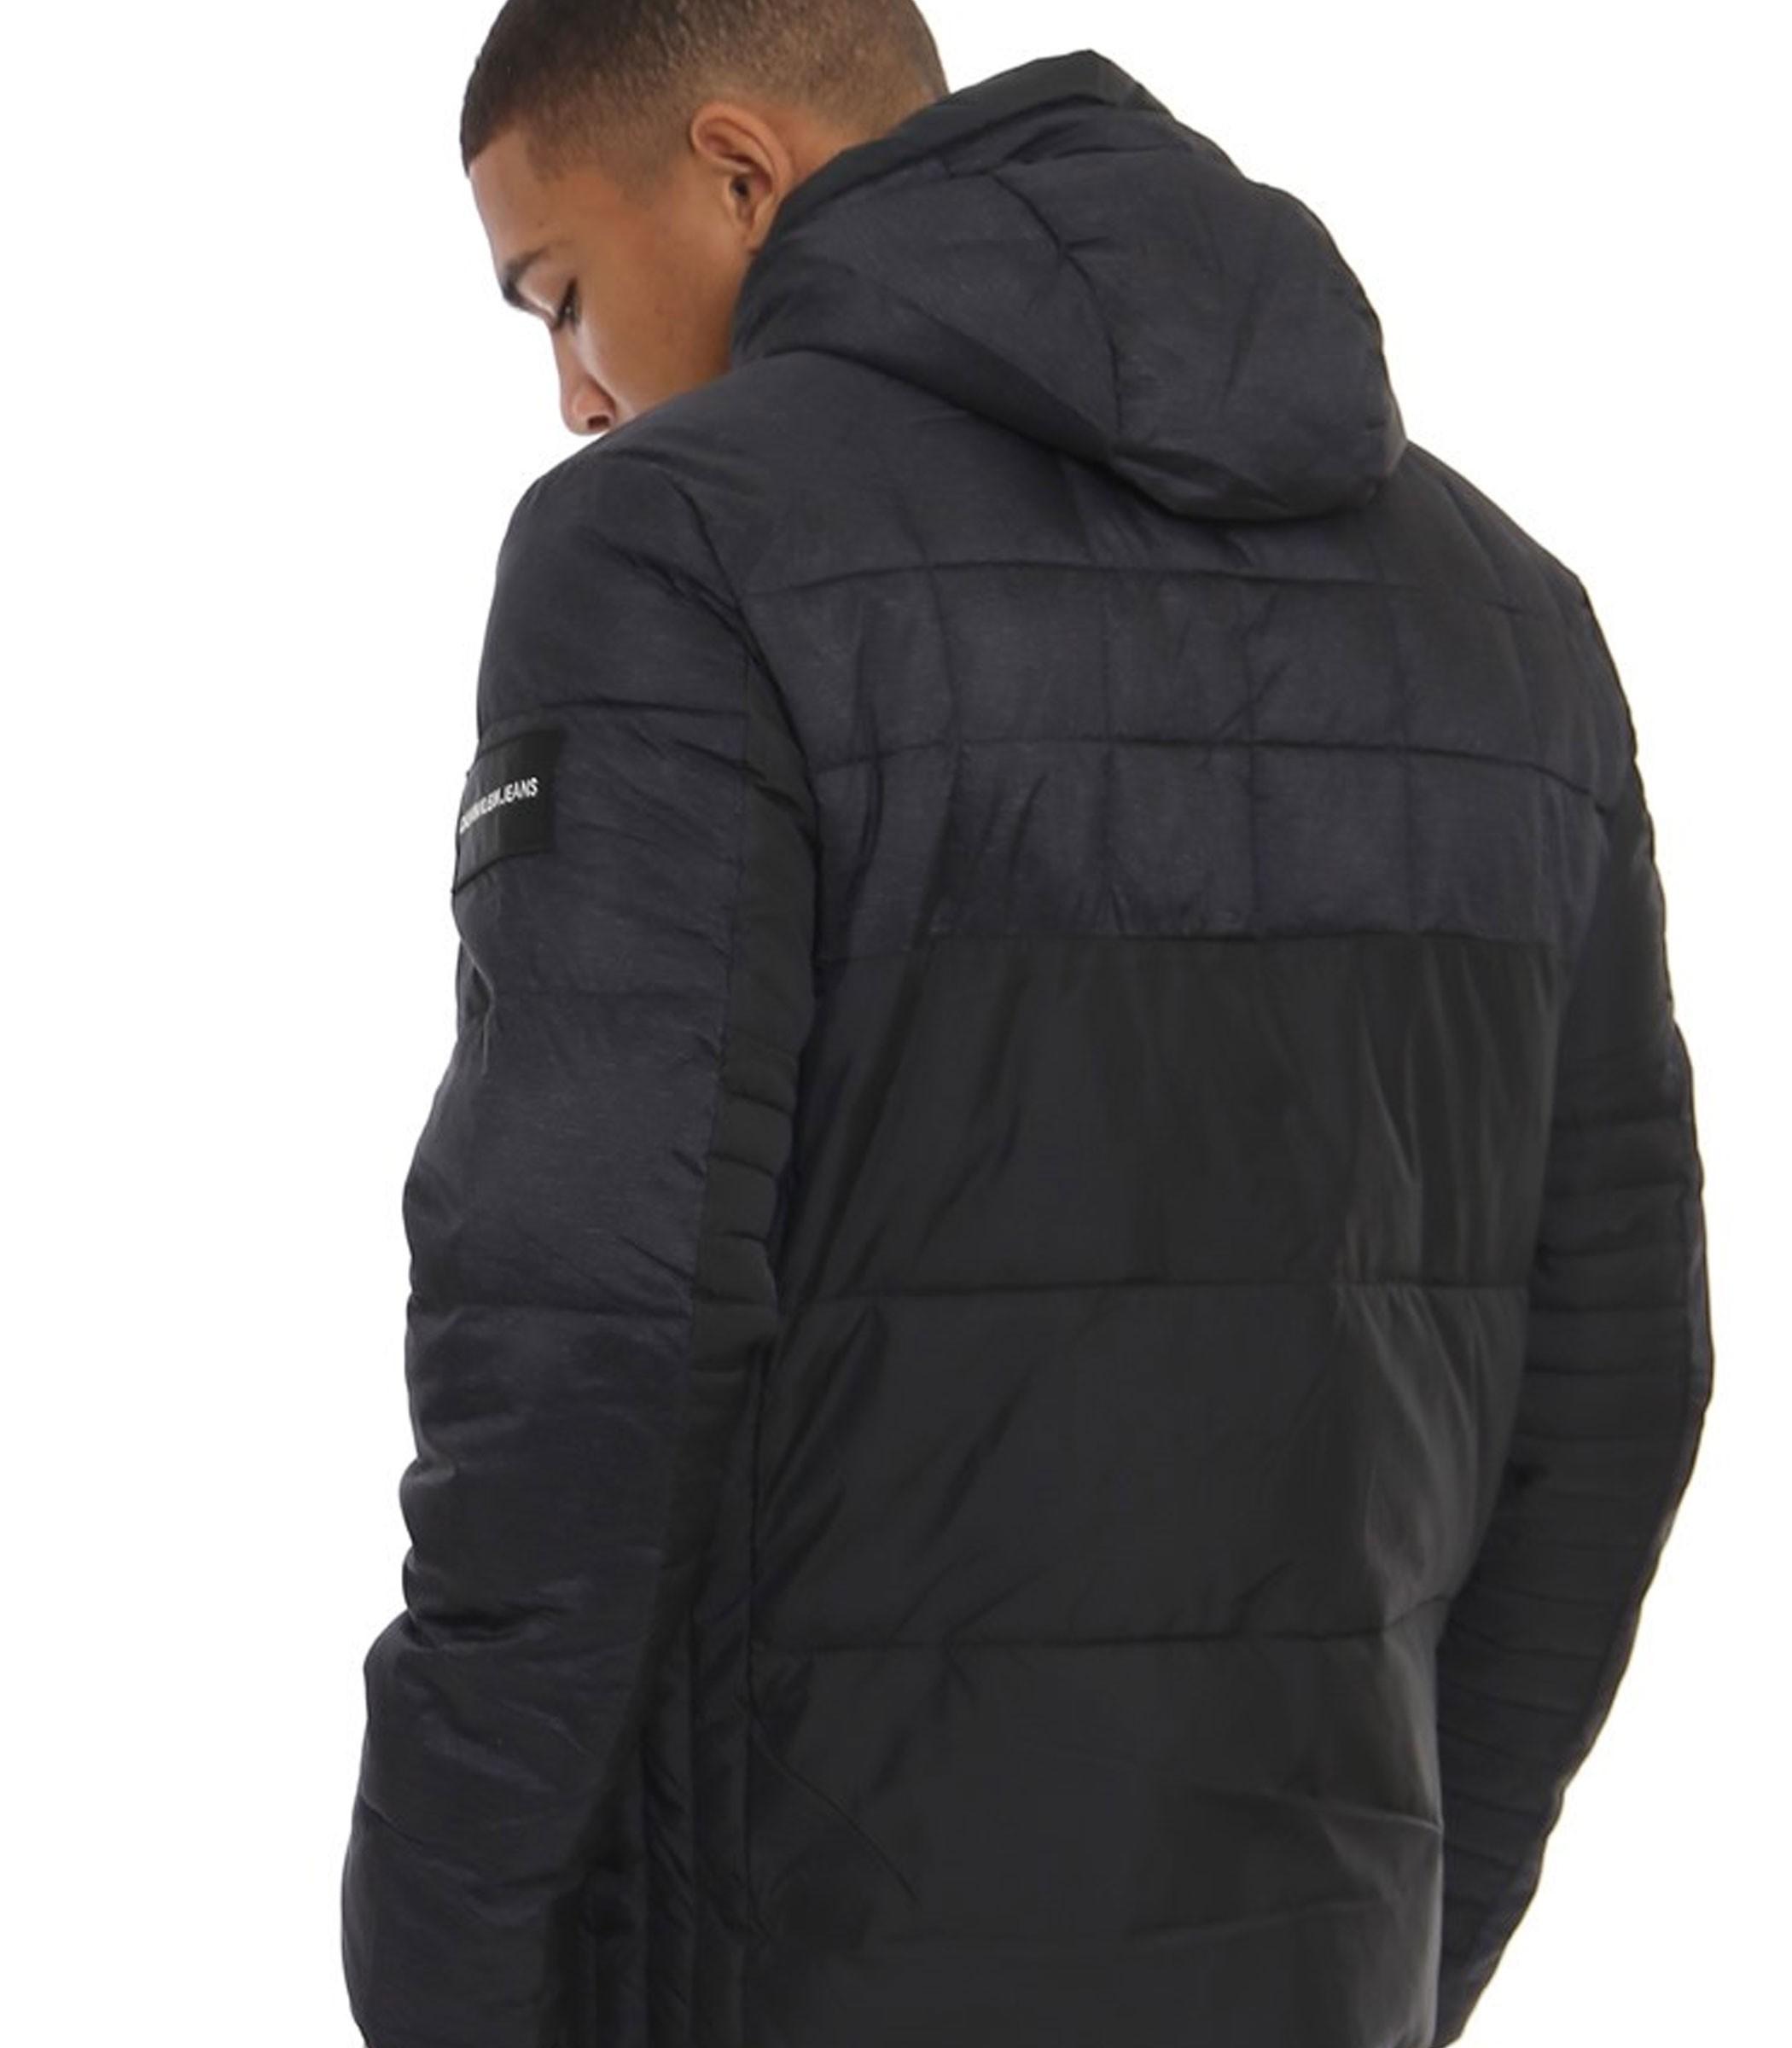 J30J309490 Giubbotto Calvin Klein Jeans Mix Media Puffer Jacket da uomo rif.  J30J309490 0a475f2c02c